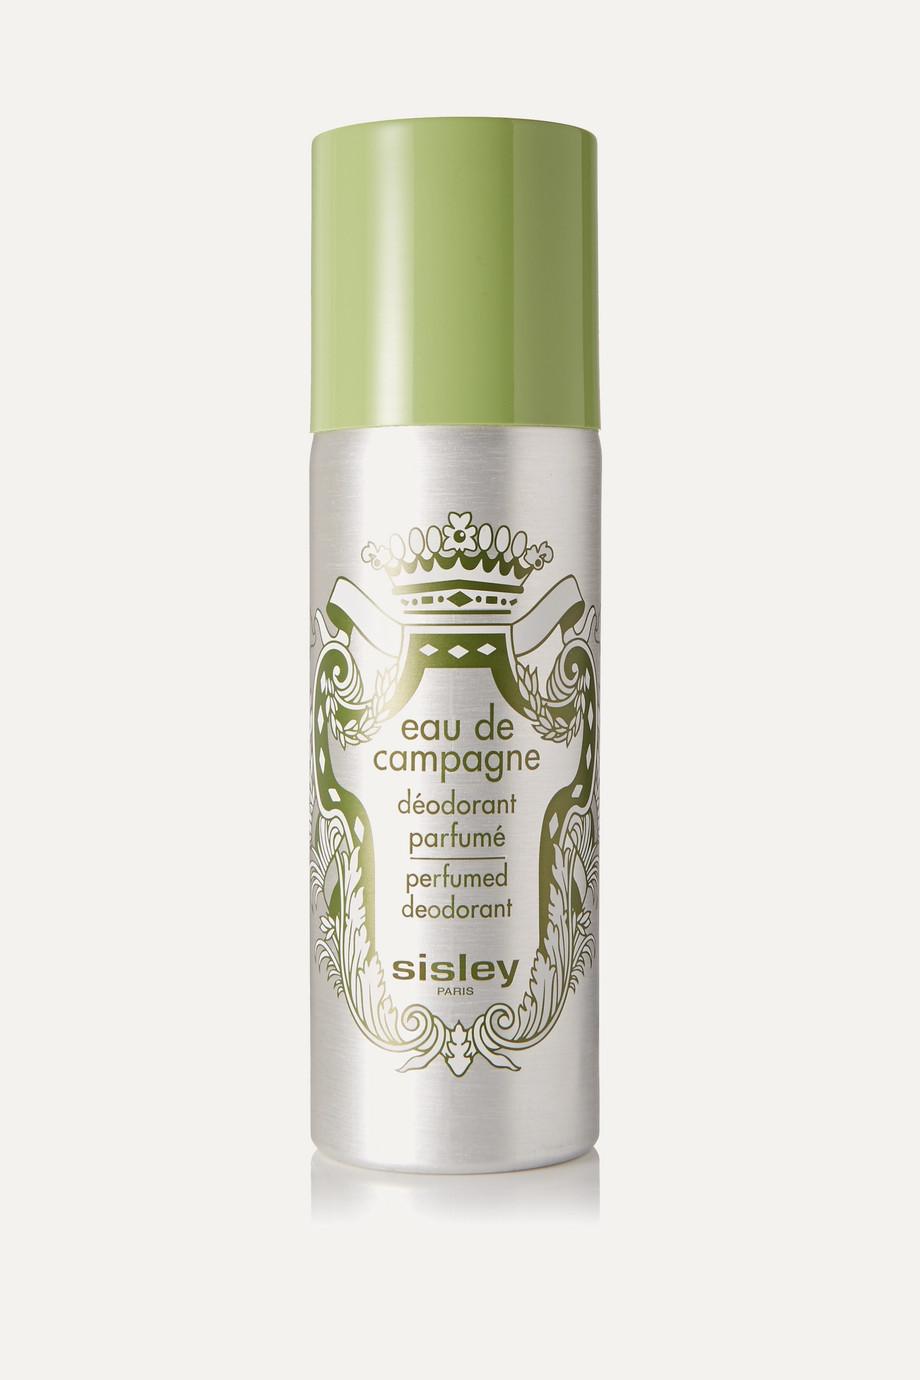 Sisley Perfumed Deodorant - Eau de Campagne, 150ml